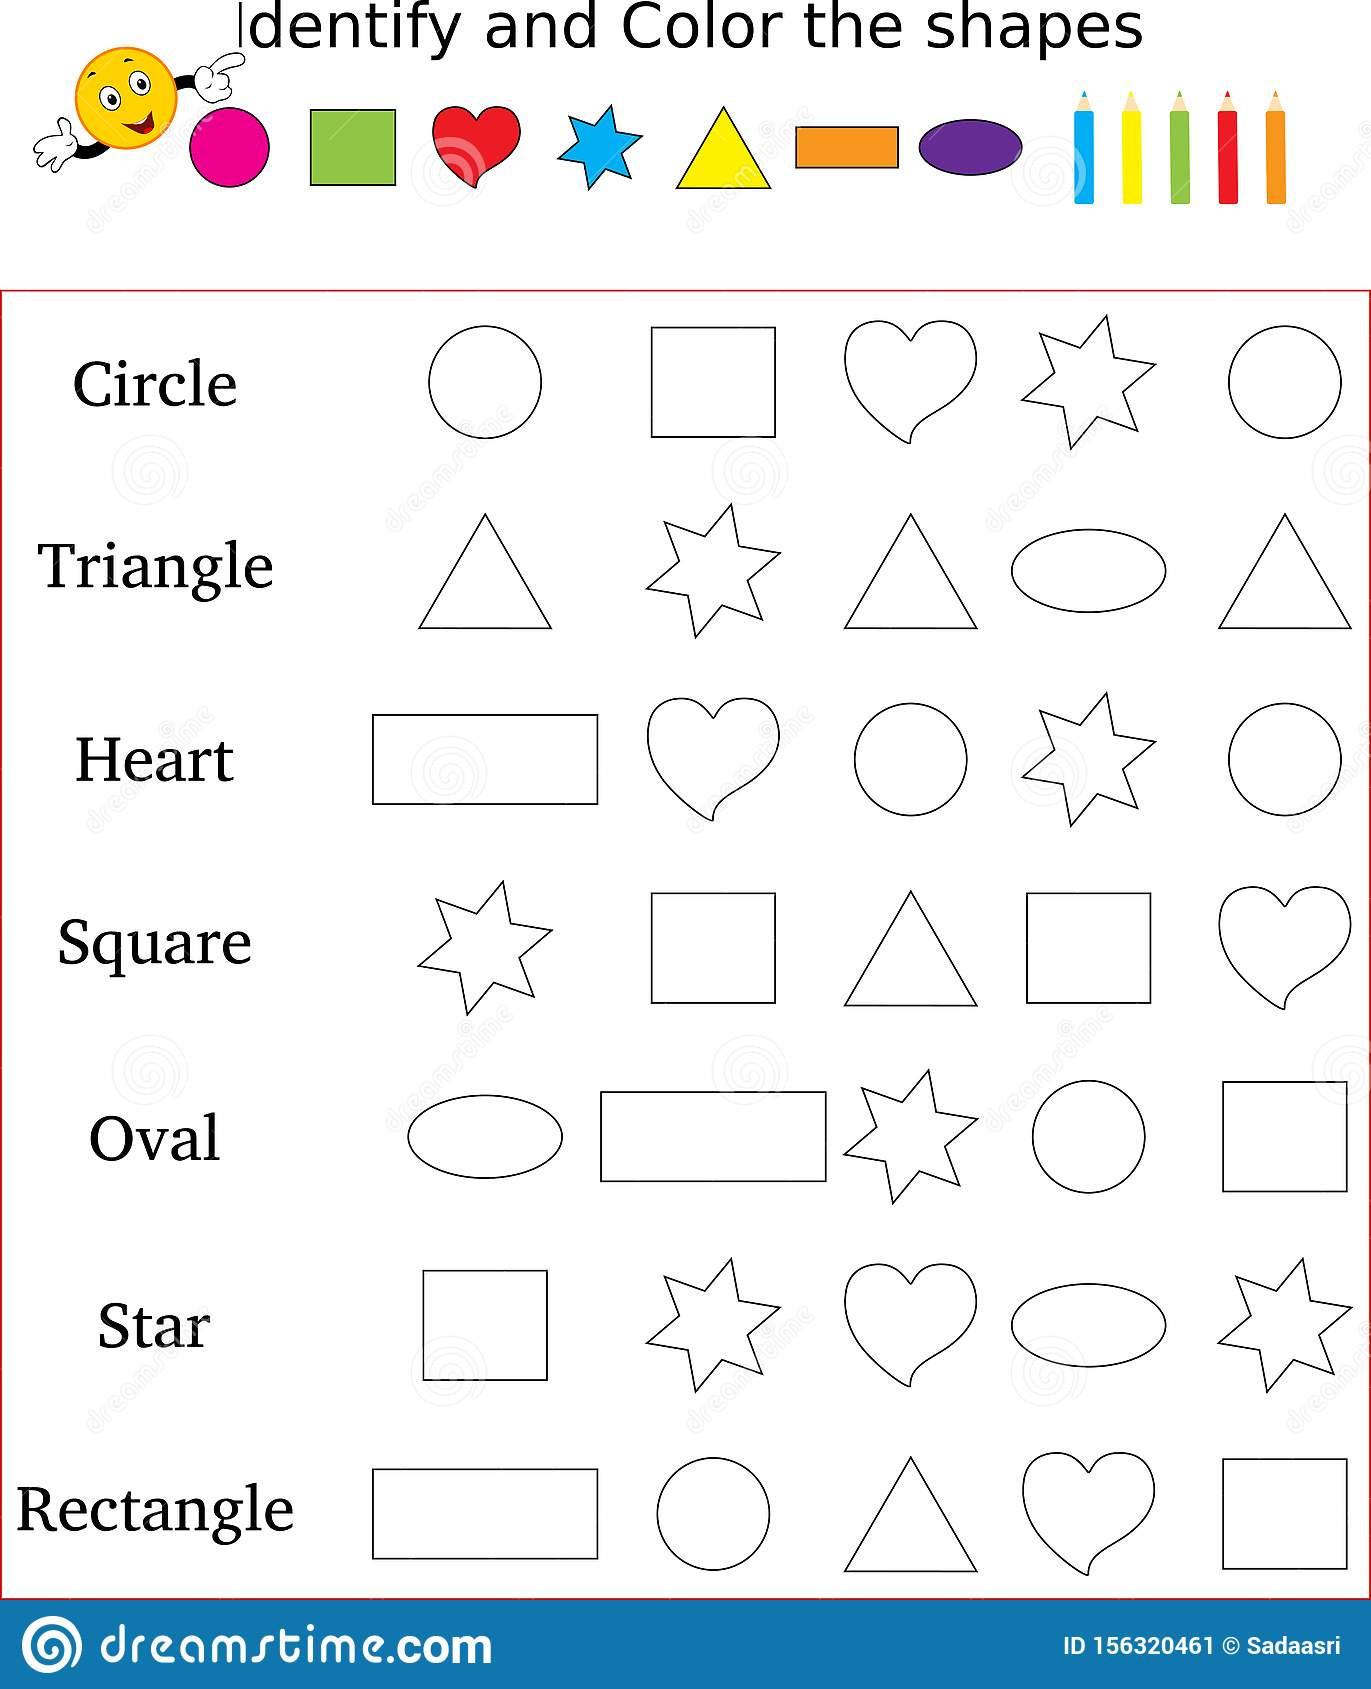 Identify Shapes Worksheet Kindergarten Identify and Color the Correct Shape Worksheet Stock Image